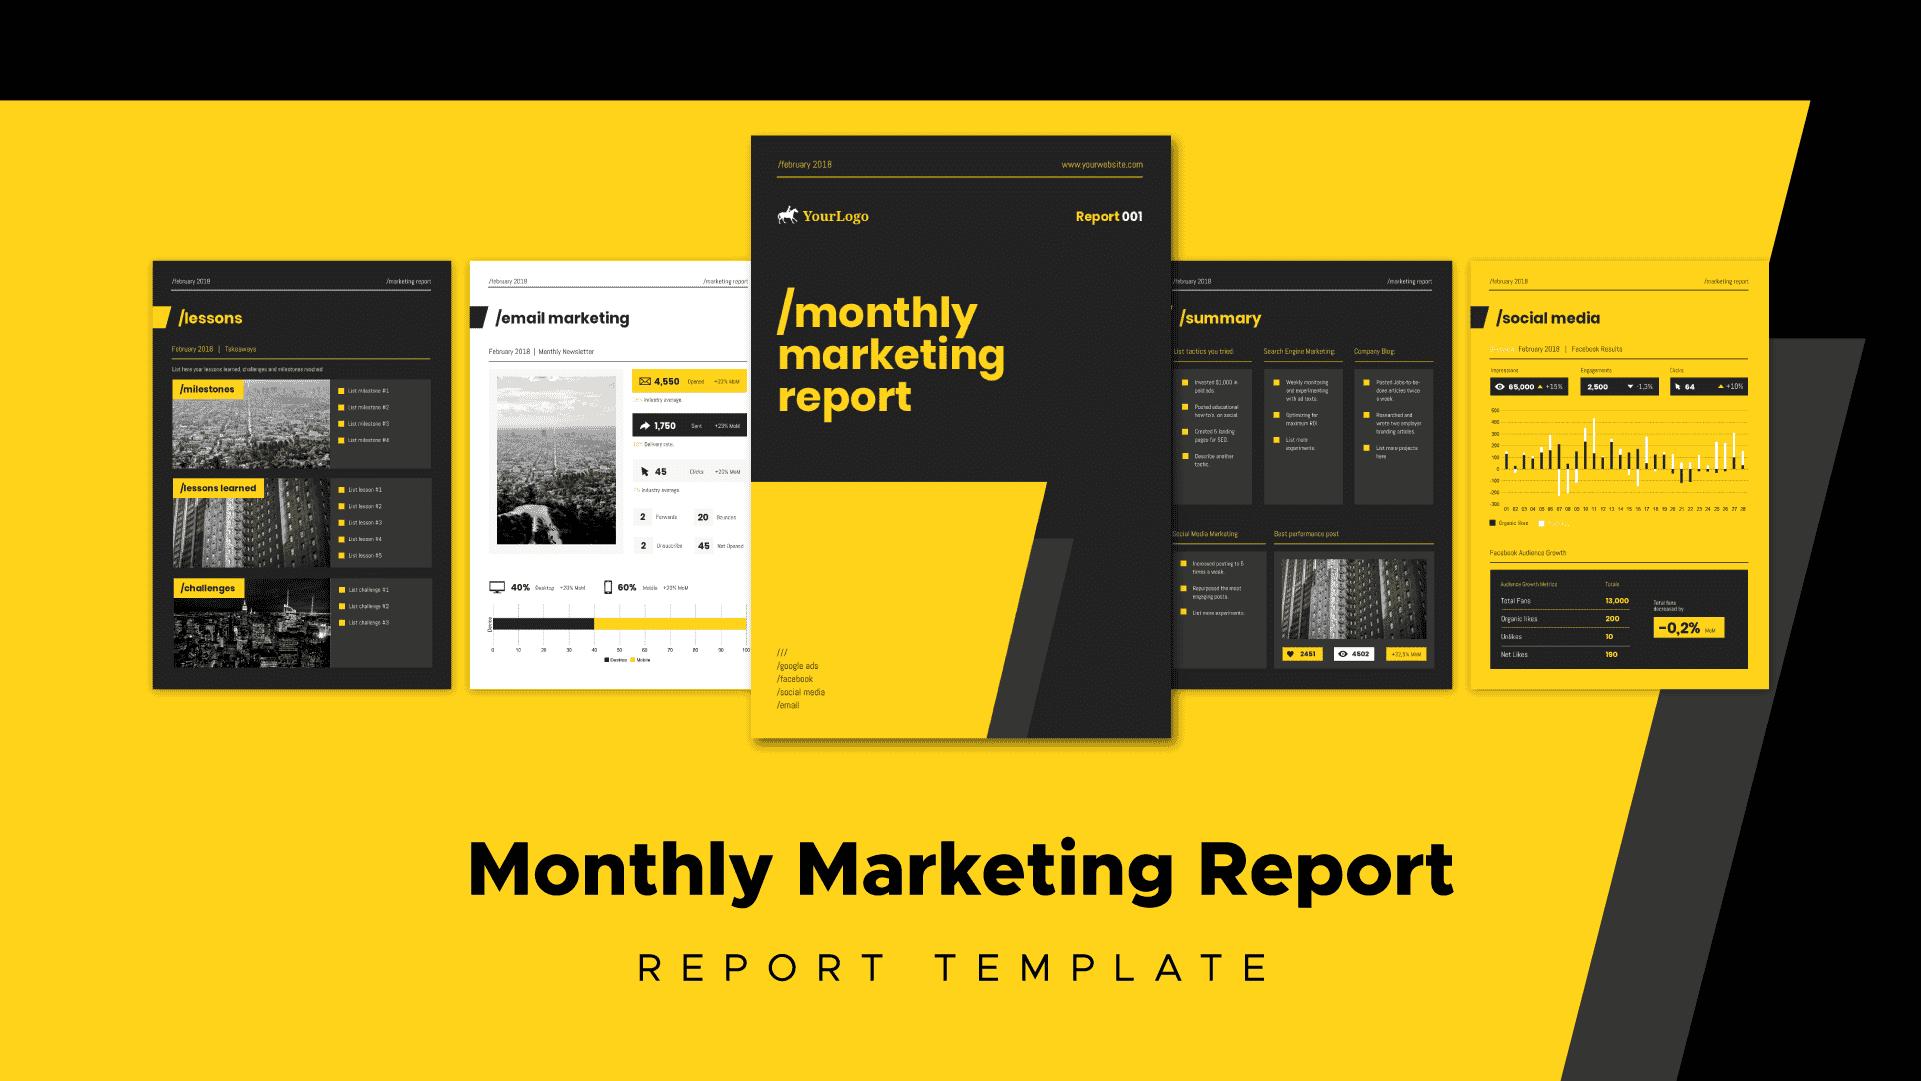 templates-visual_report_1189-6690217